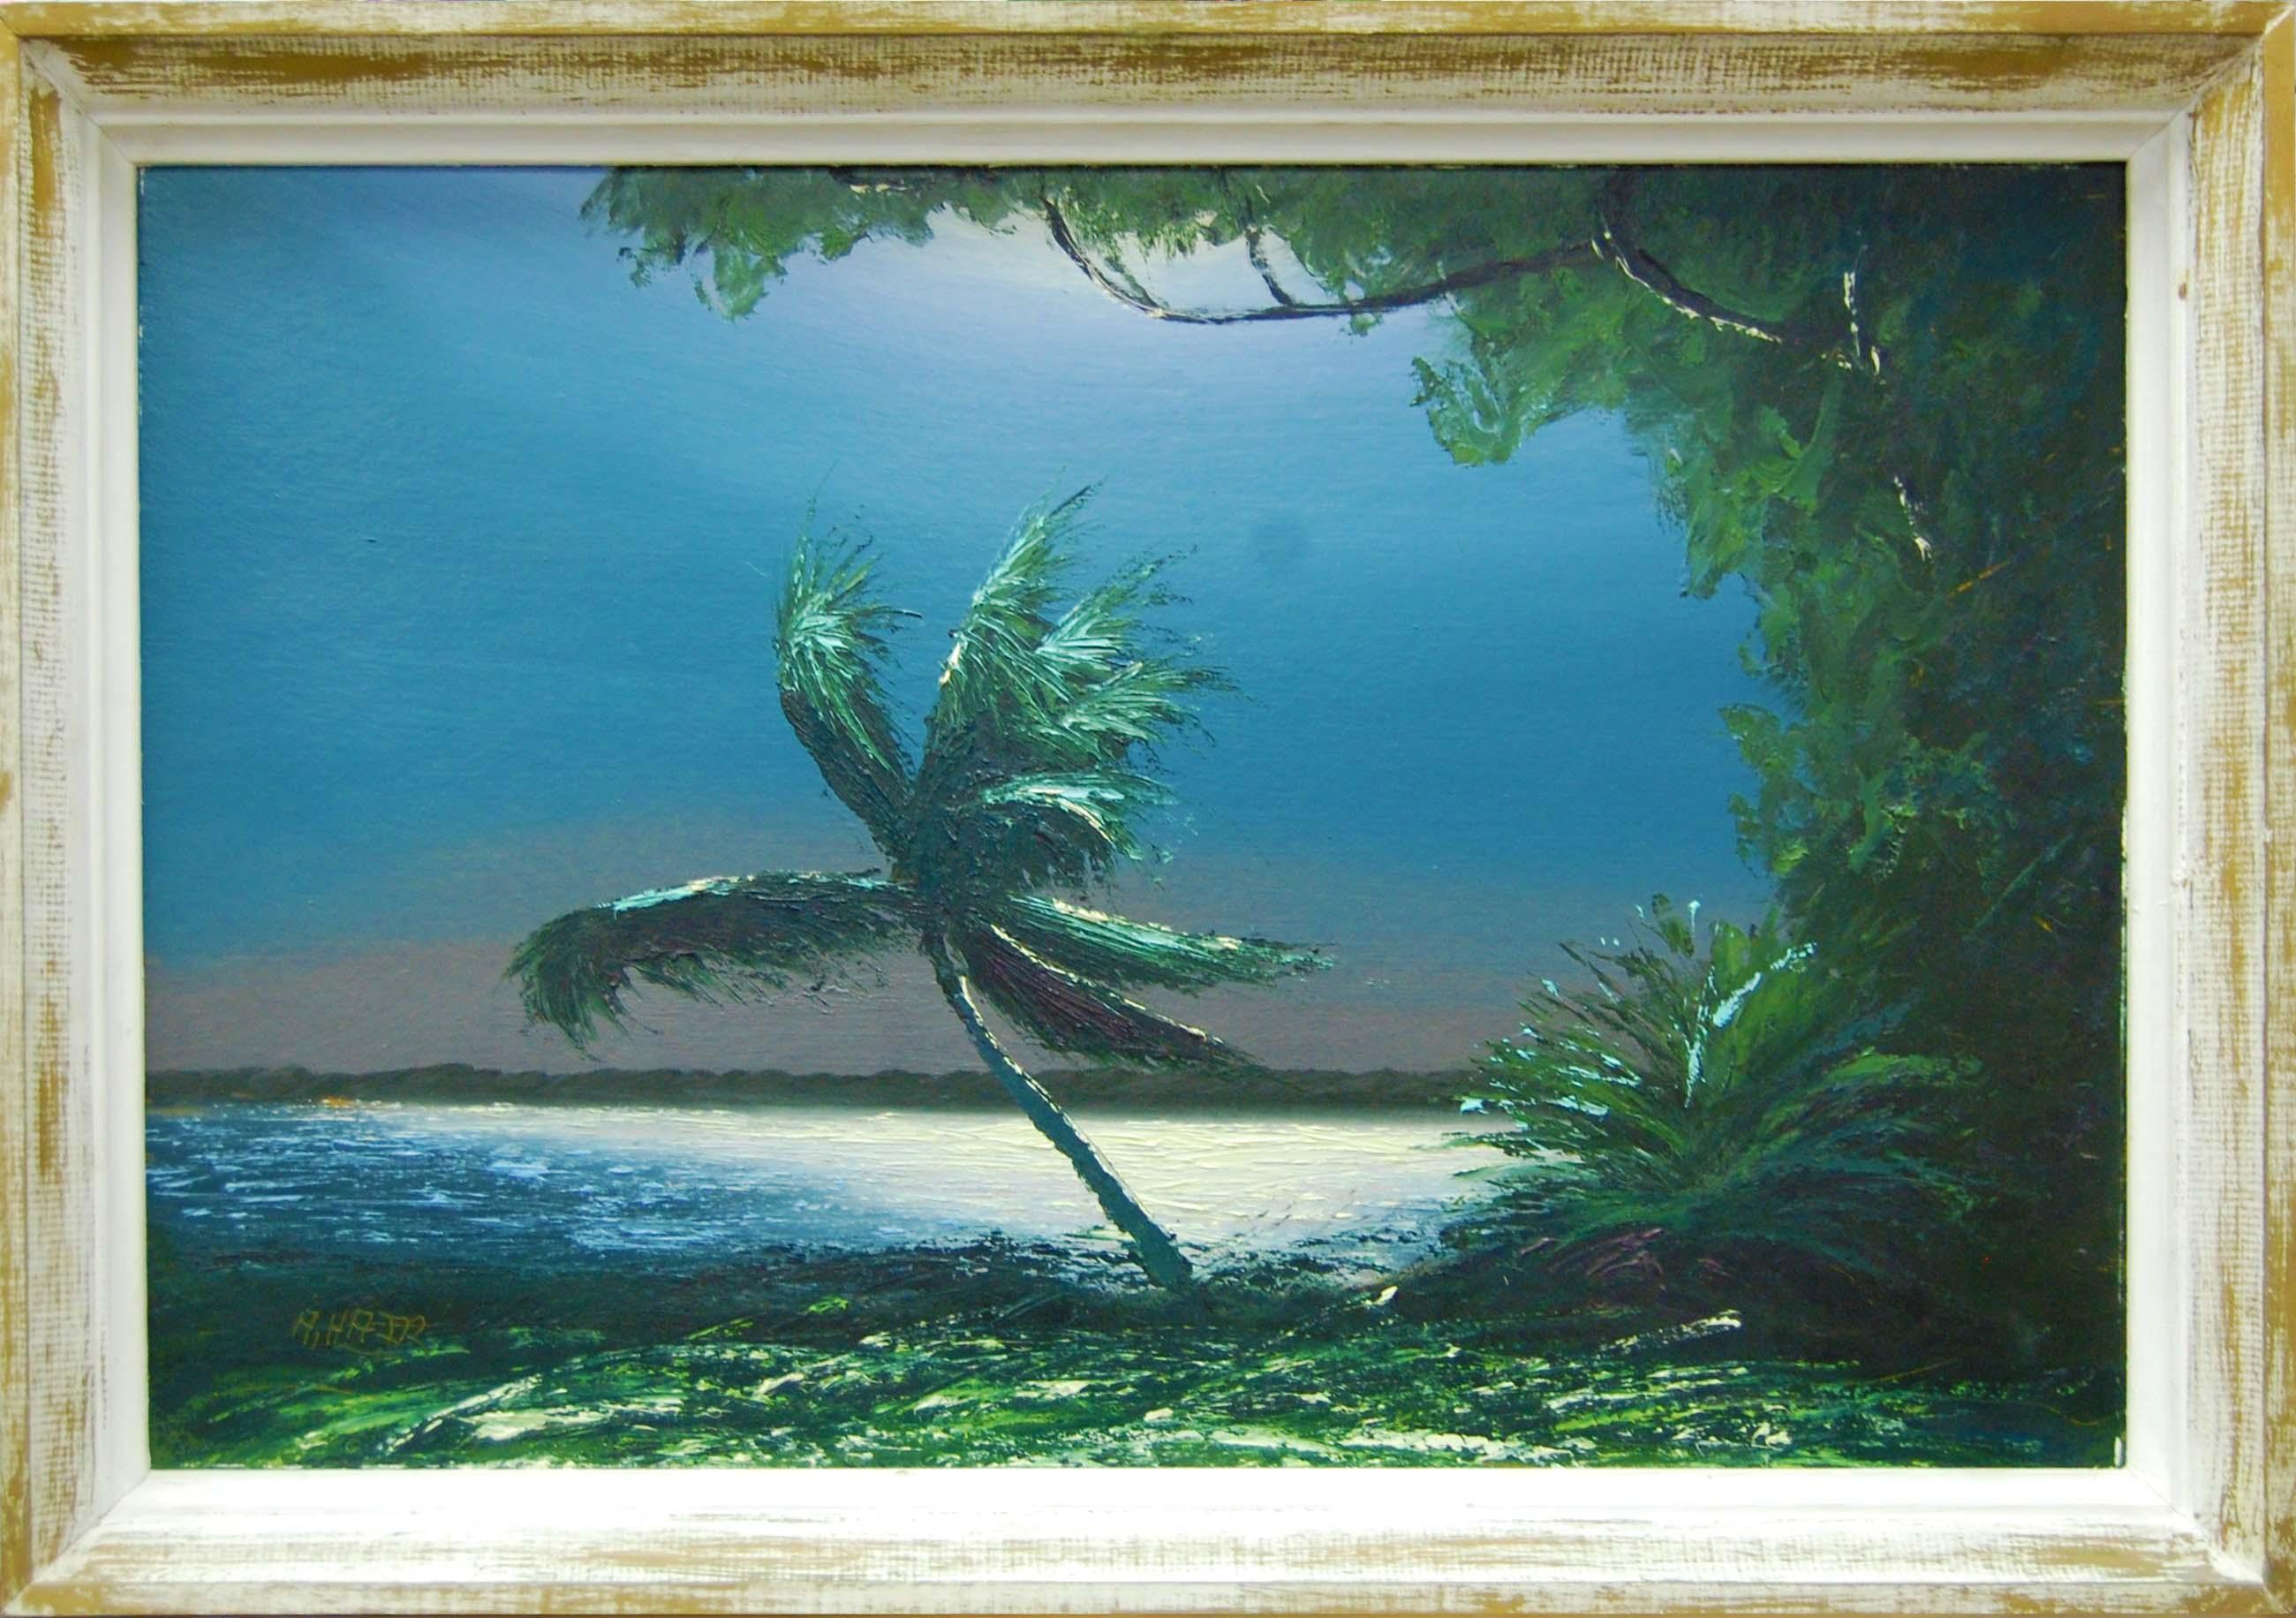 Original Artwork By Florida S Highwaymen To Star In